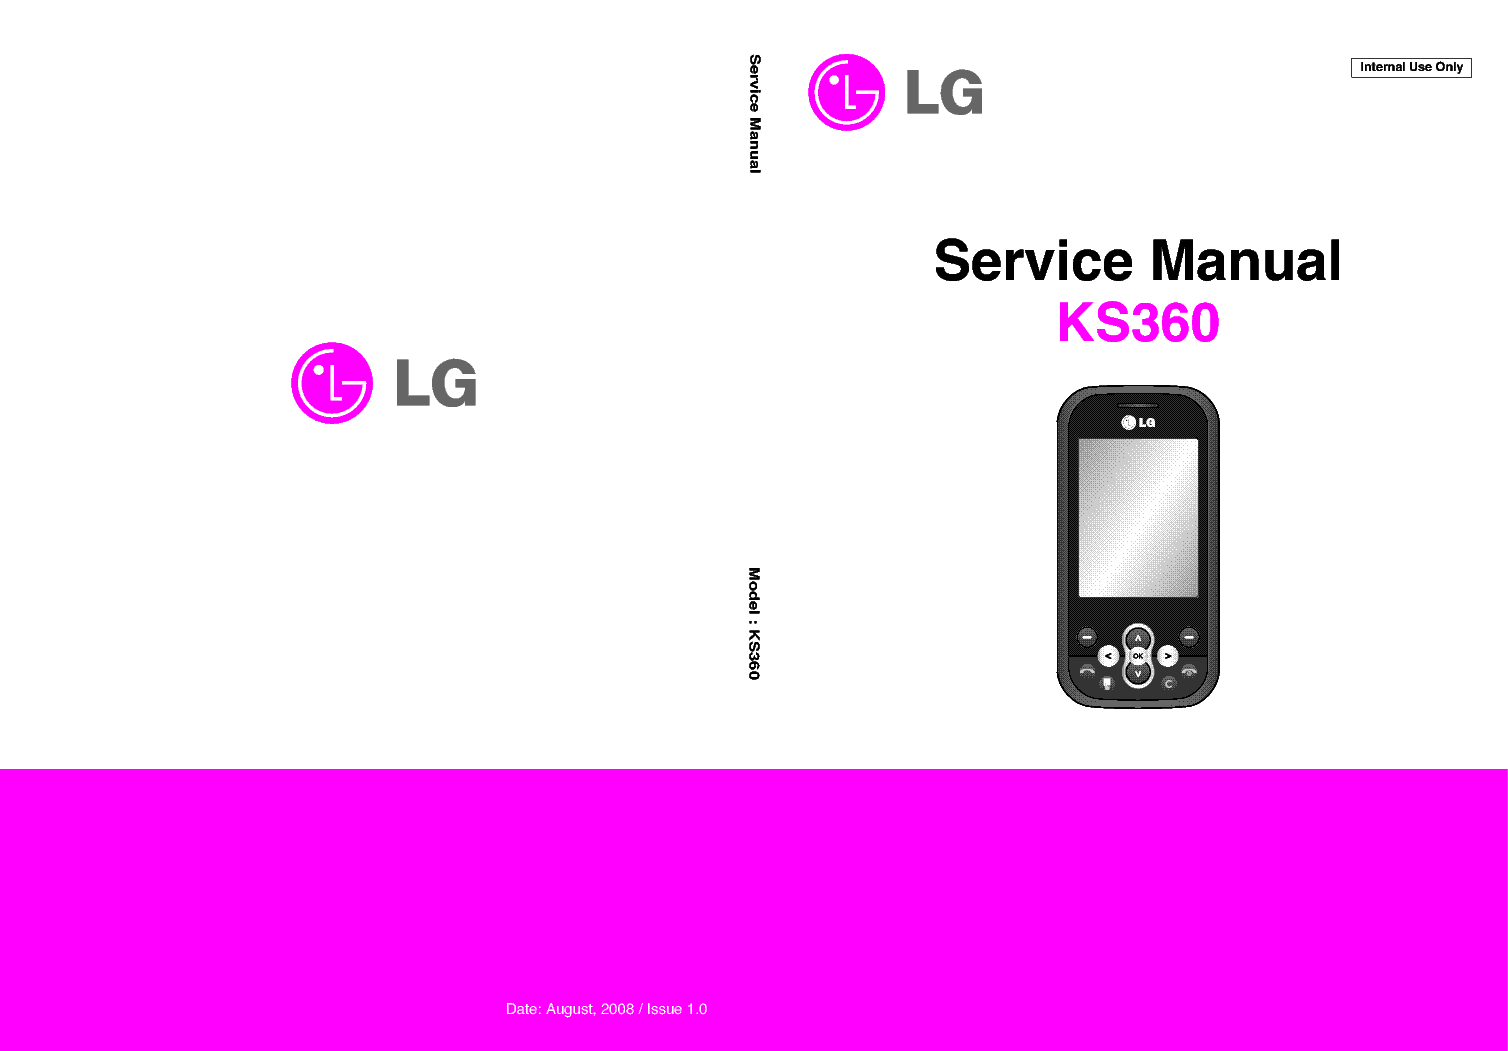 lg ks360 sm service manual download schematics eeprom. Black Bedroom Furniture Sets. Home Design Ideas